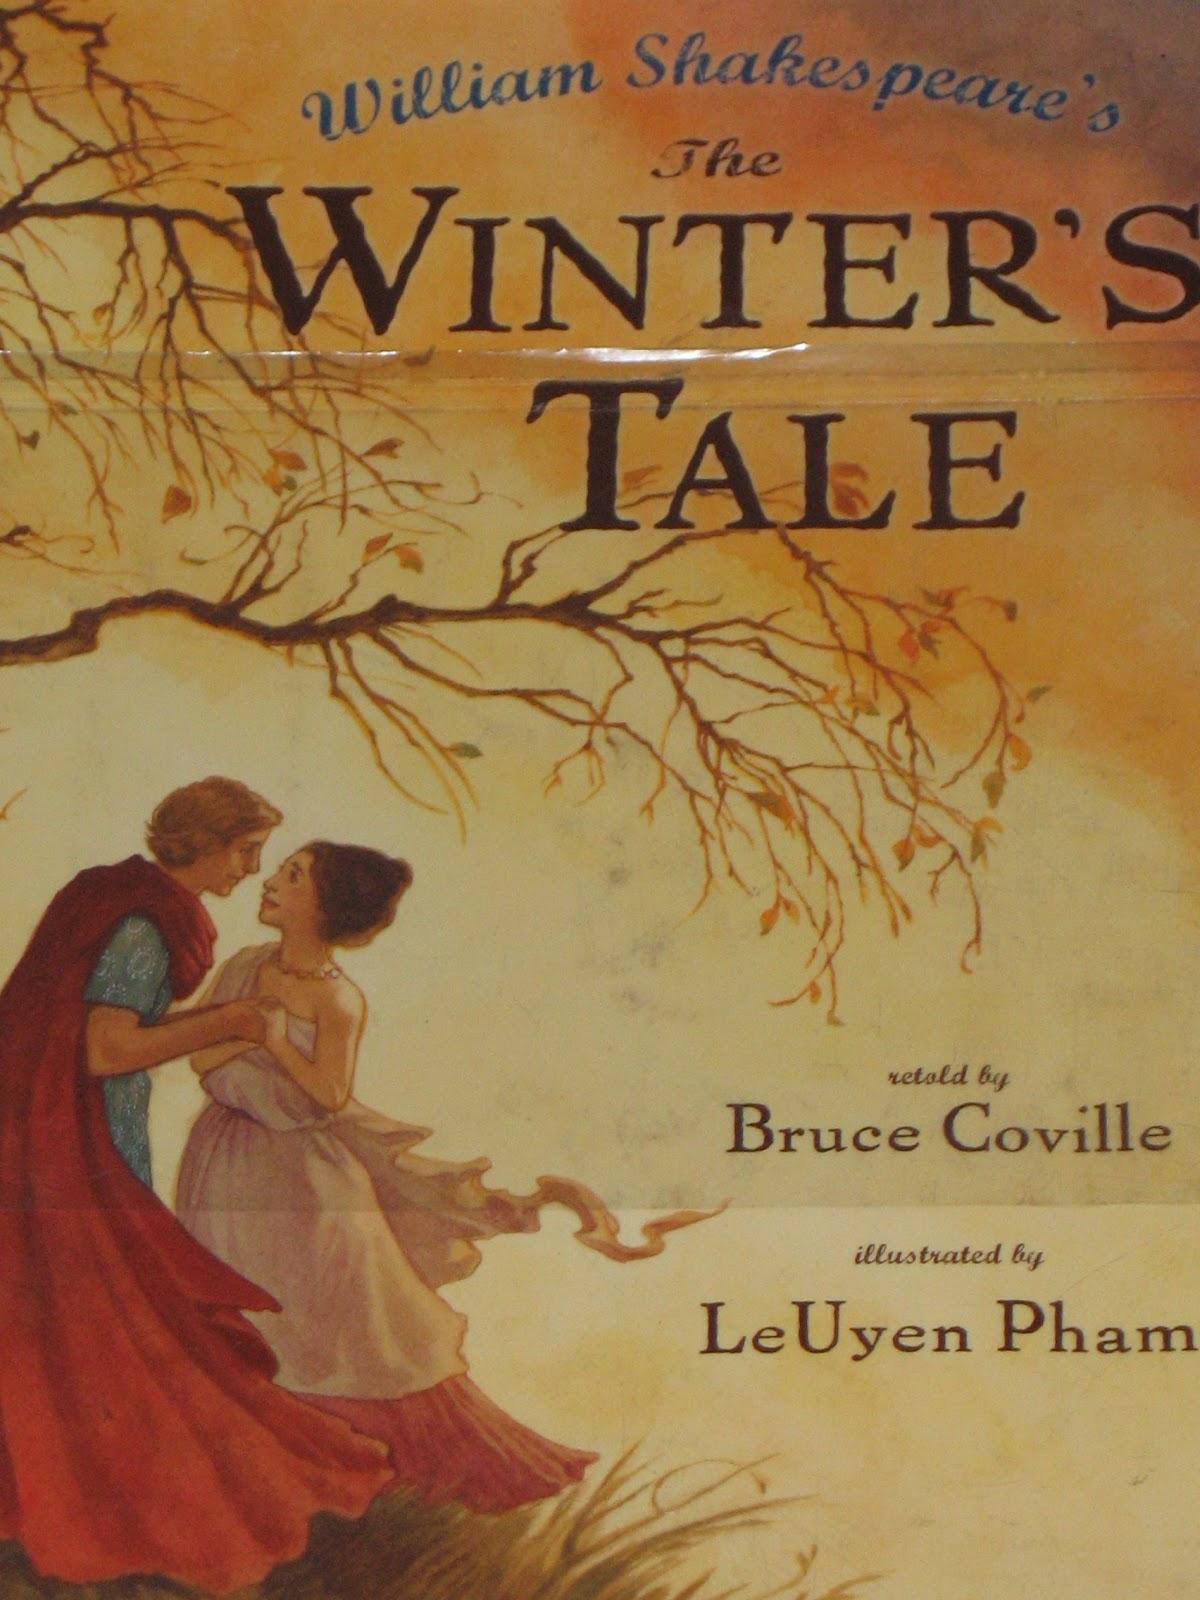 The Winter's Tale Critical Essays